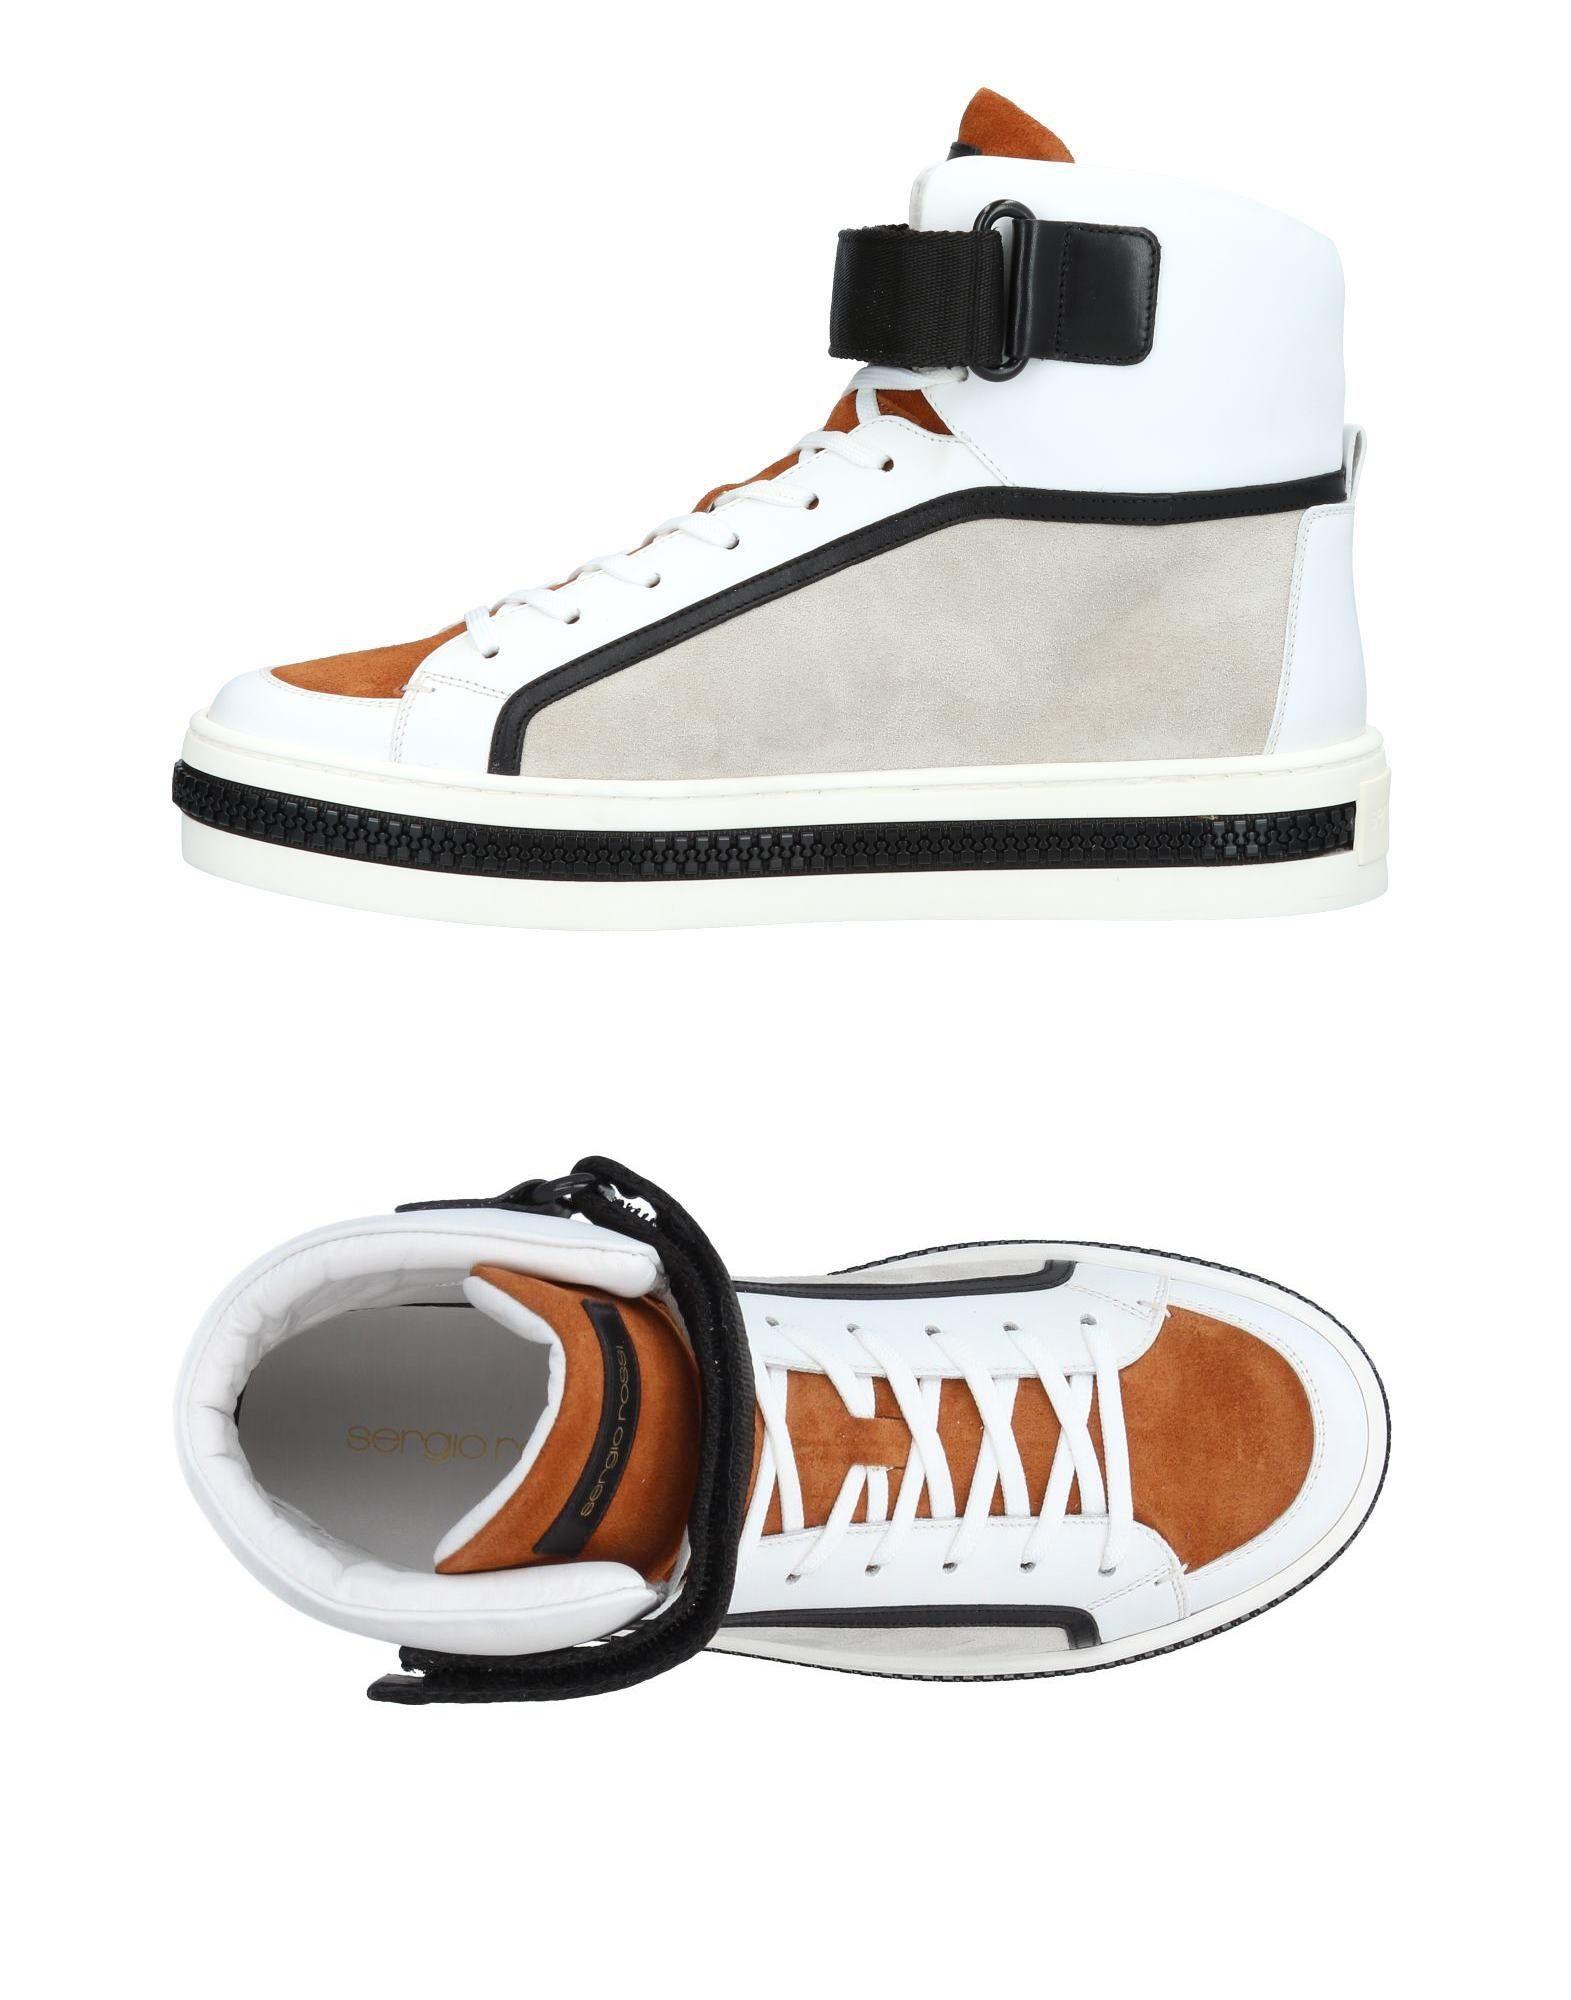 Sergio Rossi Sneakers Herren  11412445SM Gute Qualität beliebte Schuhe